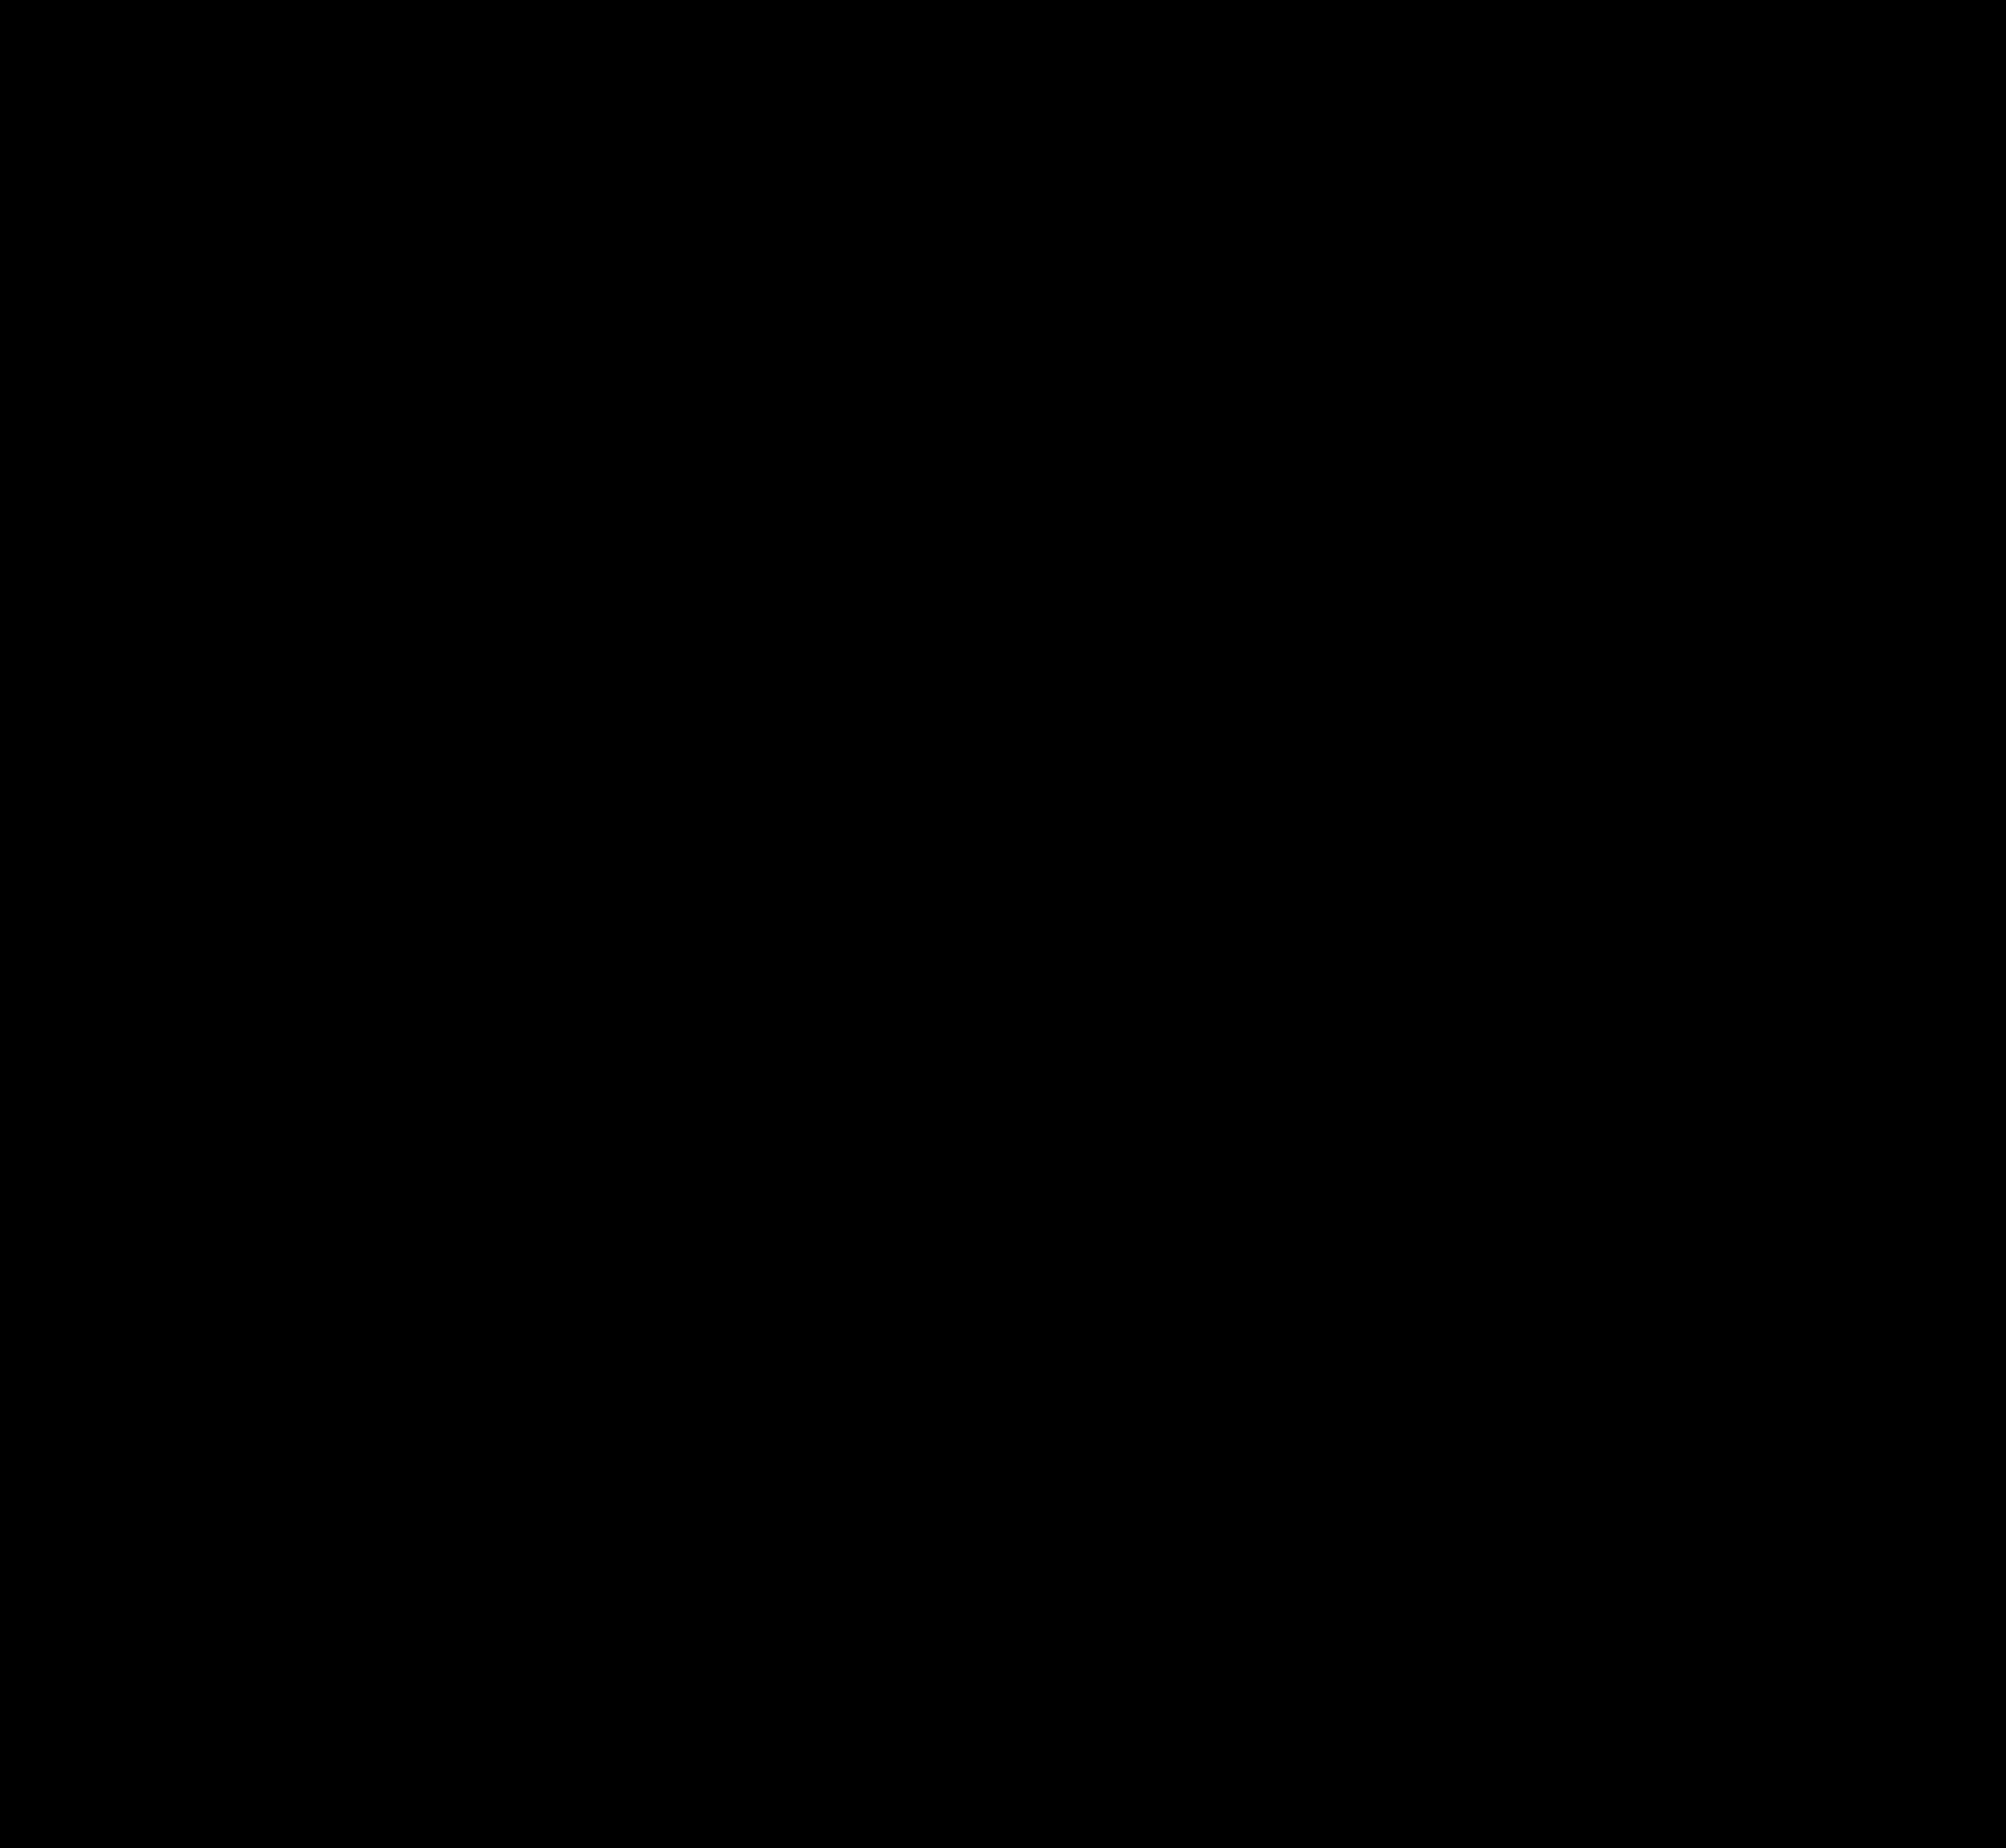 ECHOGAR-logo (3) 3000px.png